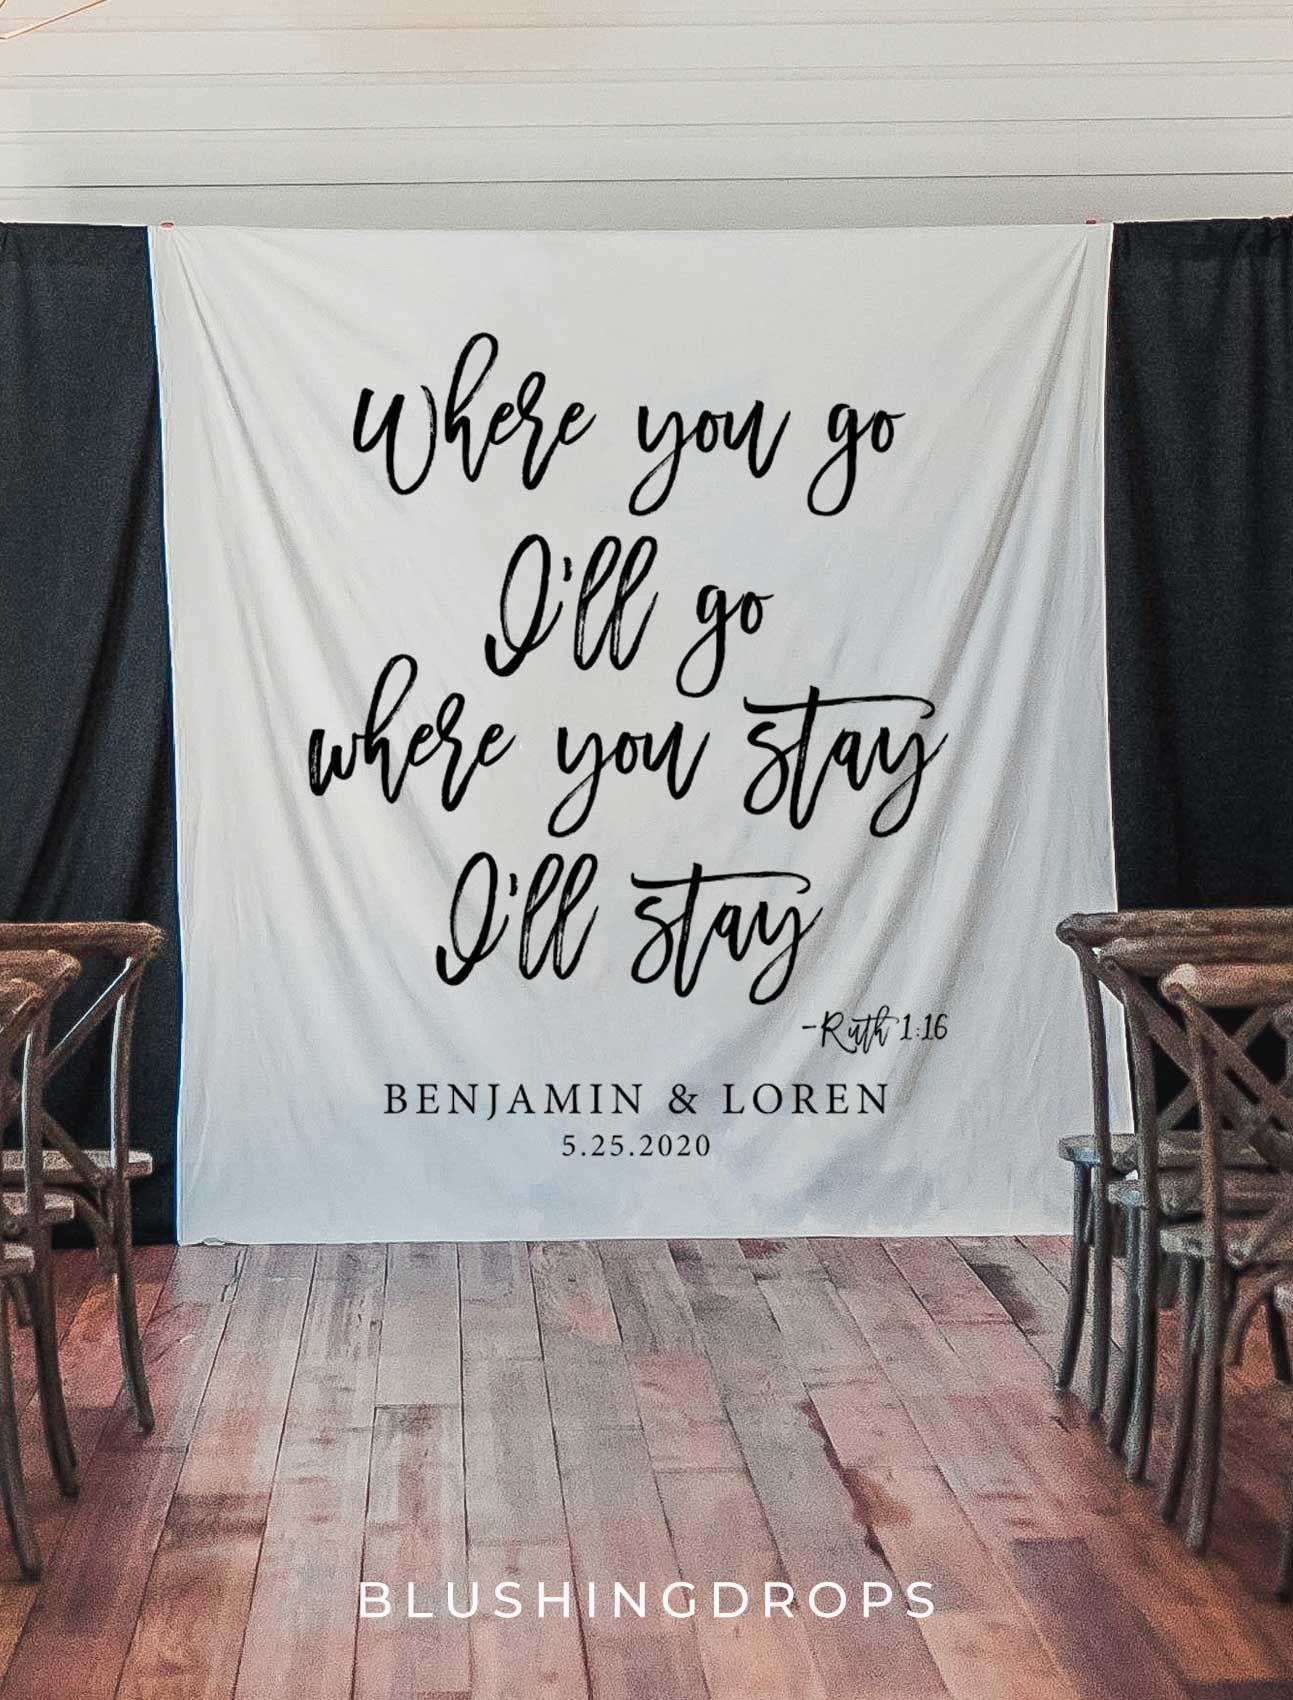 Wedding Backdrop For Reception Christian Wedding Decoration Ideas Rustic Wedding Decor Wedding Banner Backdrop Wedding Bible Verse In 2020 Hochzeitsbibel Hochzeitsbibelverse Und Christliche Hochzeiten